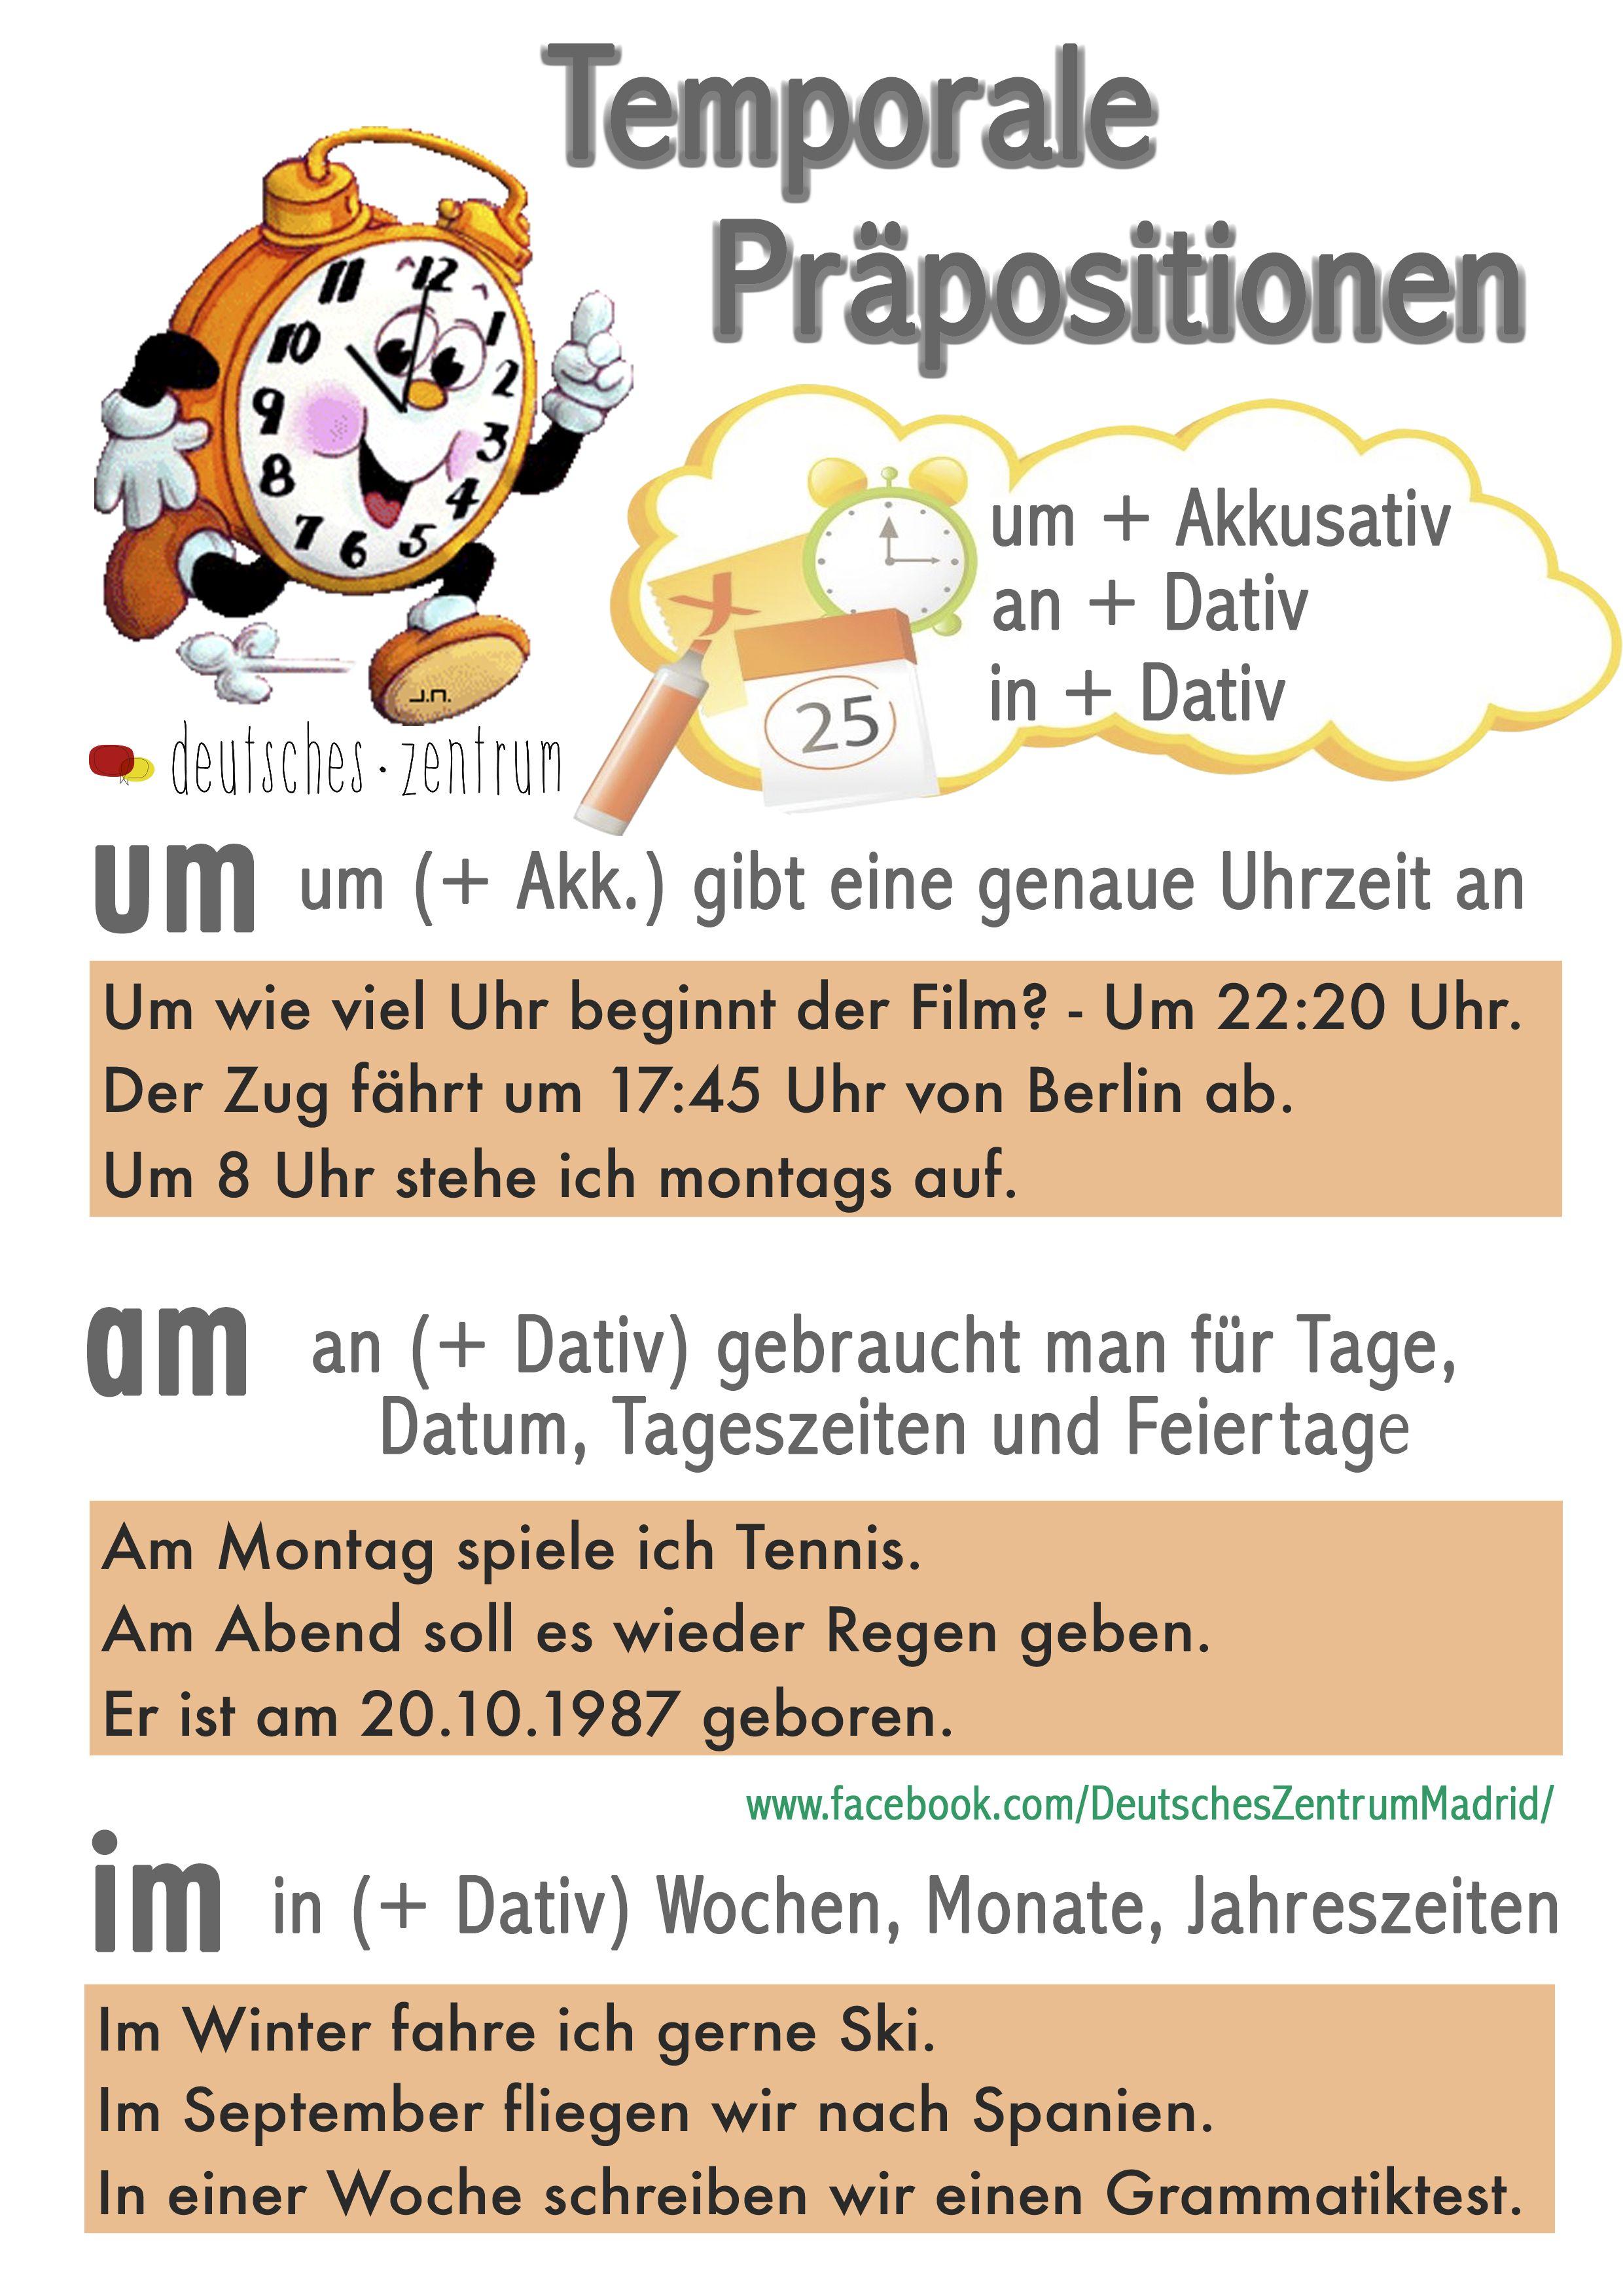 German Grammatical Genders … | Deutschland | Német…